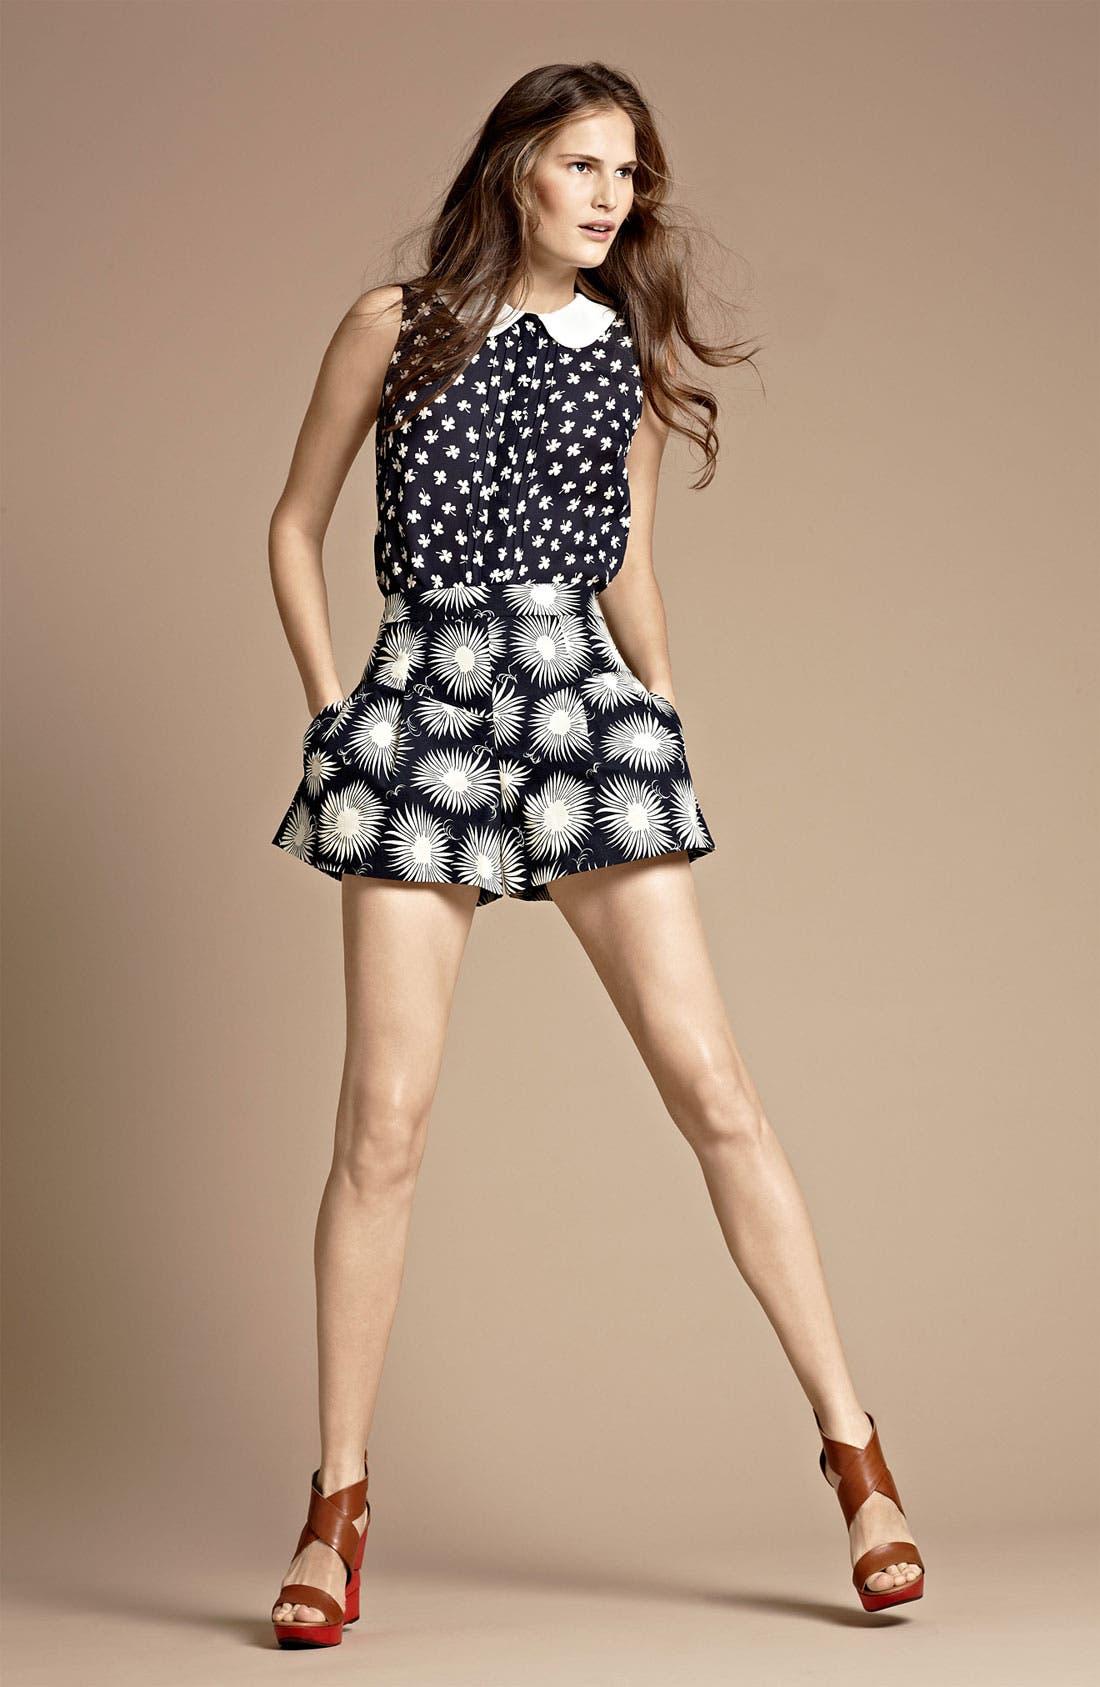 Main Image - Milly Silk Top & Shorts